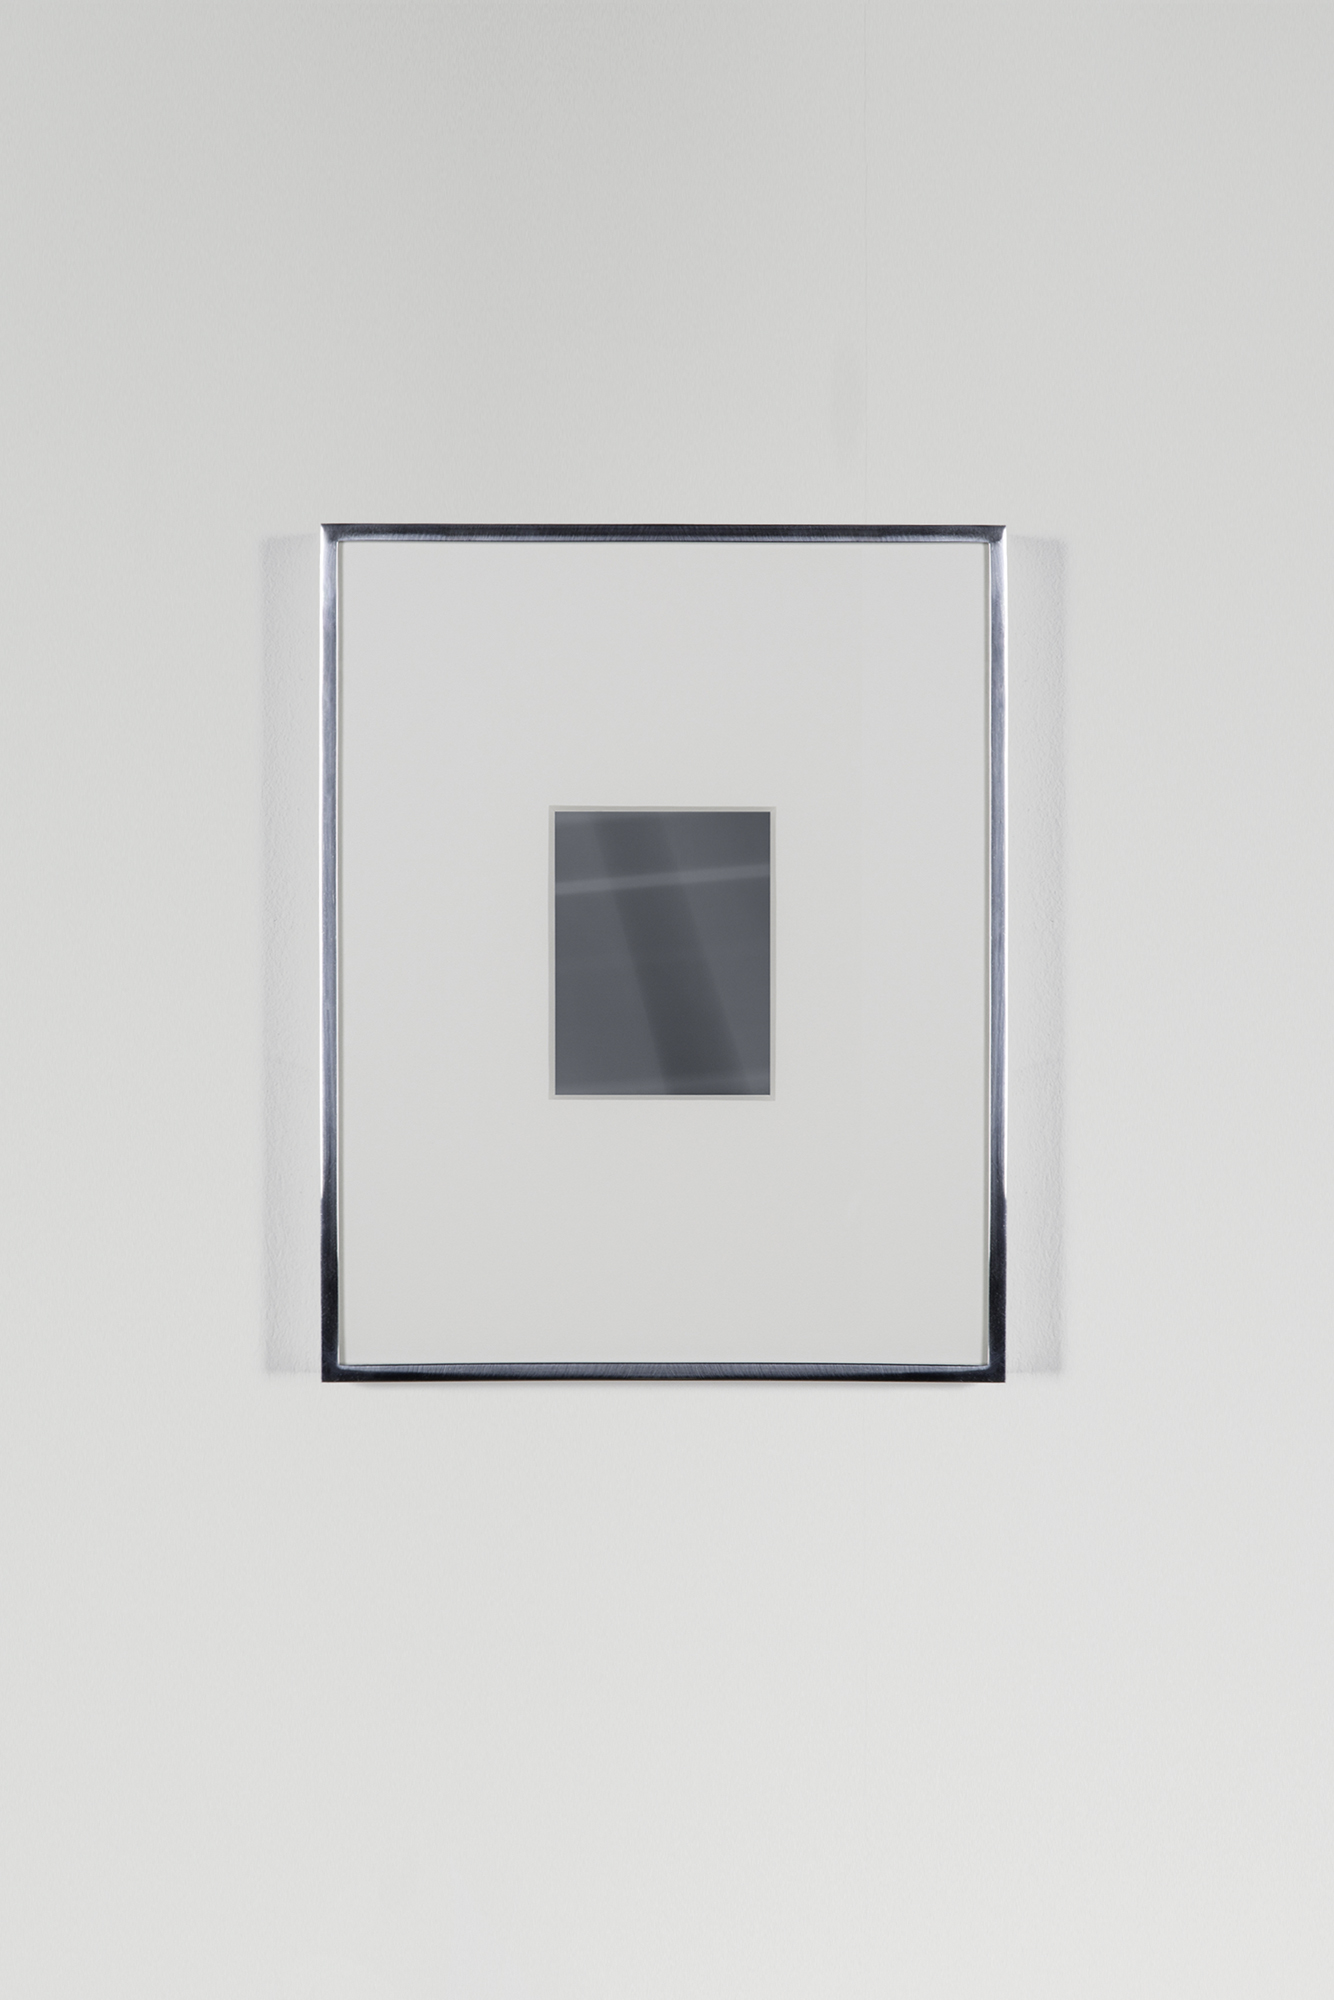 Transparency (Negative) [Kodak Portra 400NC Em. No. 1022: December 3–5, 2015 LAX/EWR EWR/LAX]    2017   Epson Ultrachrome K3 archival ink jet print on Museo Silver Rag Paper  14 x 11 inches   Transparencies, 2014–